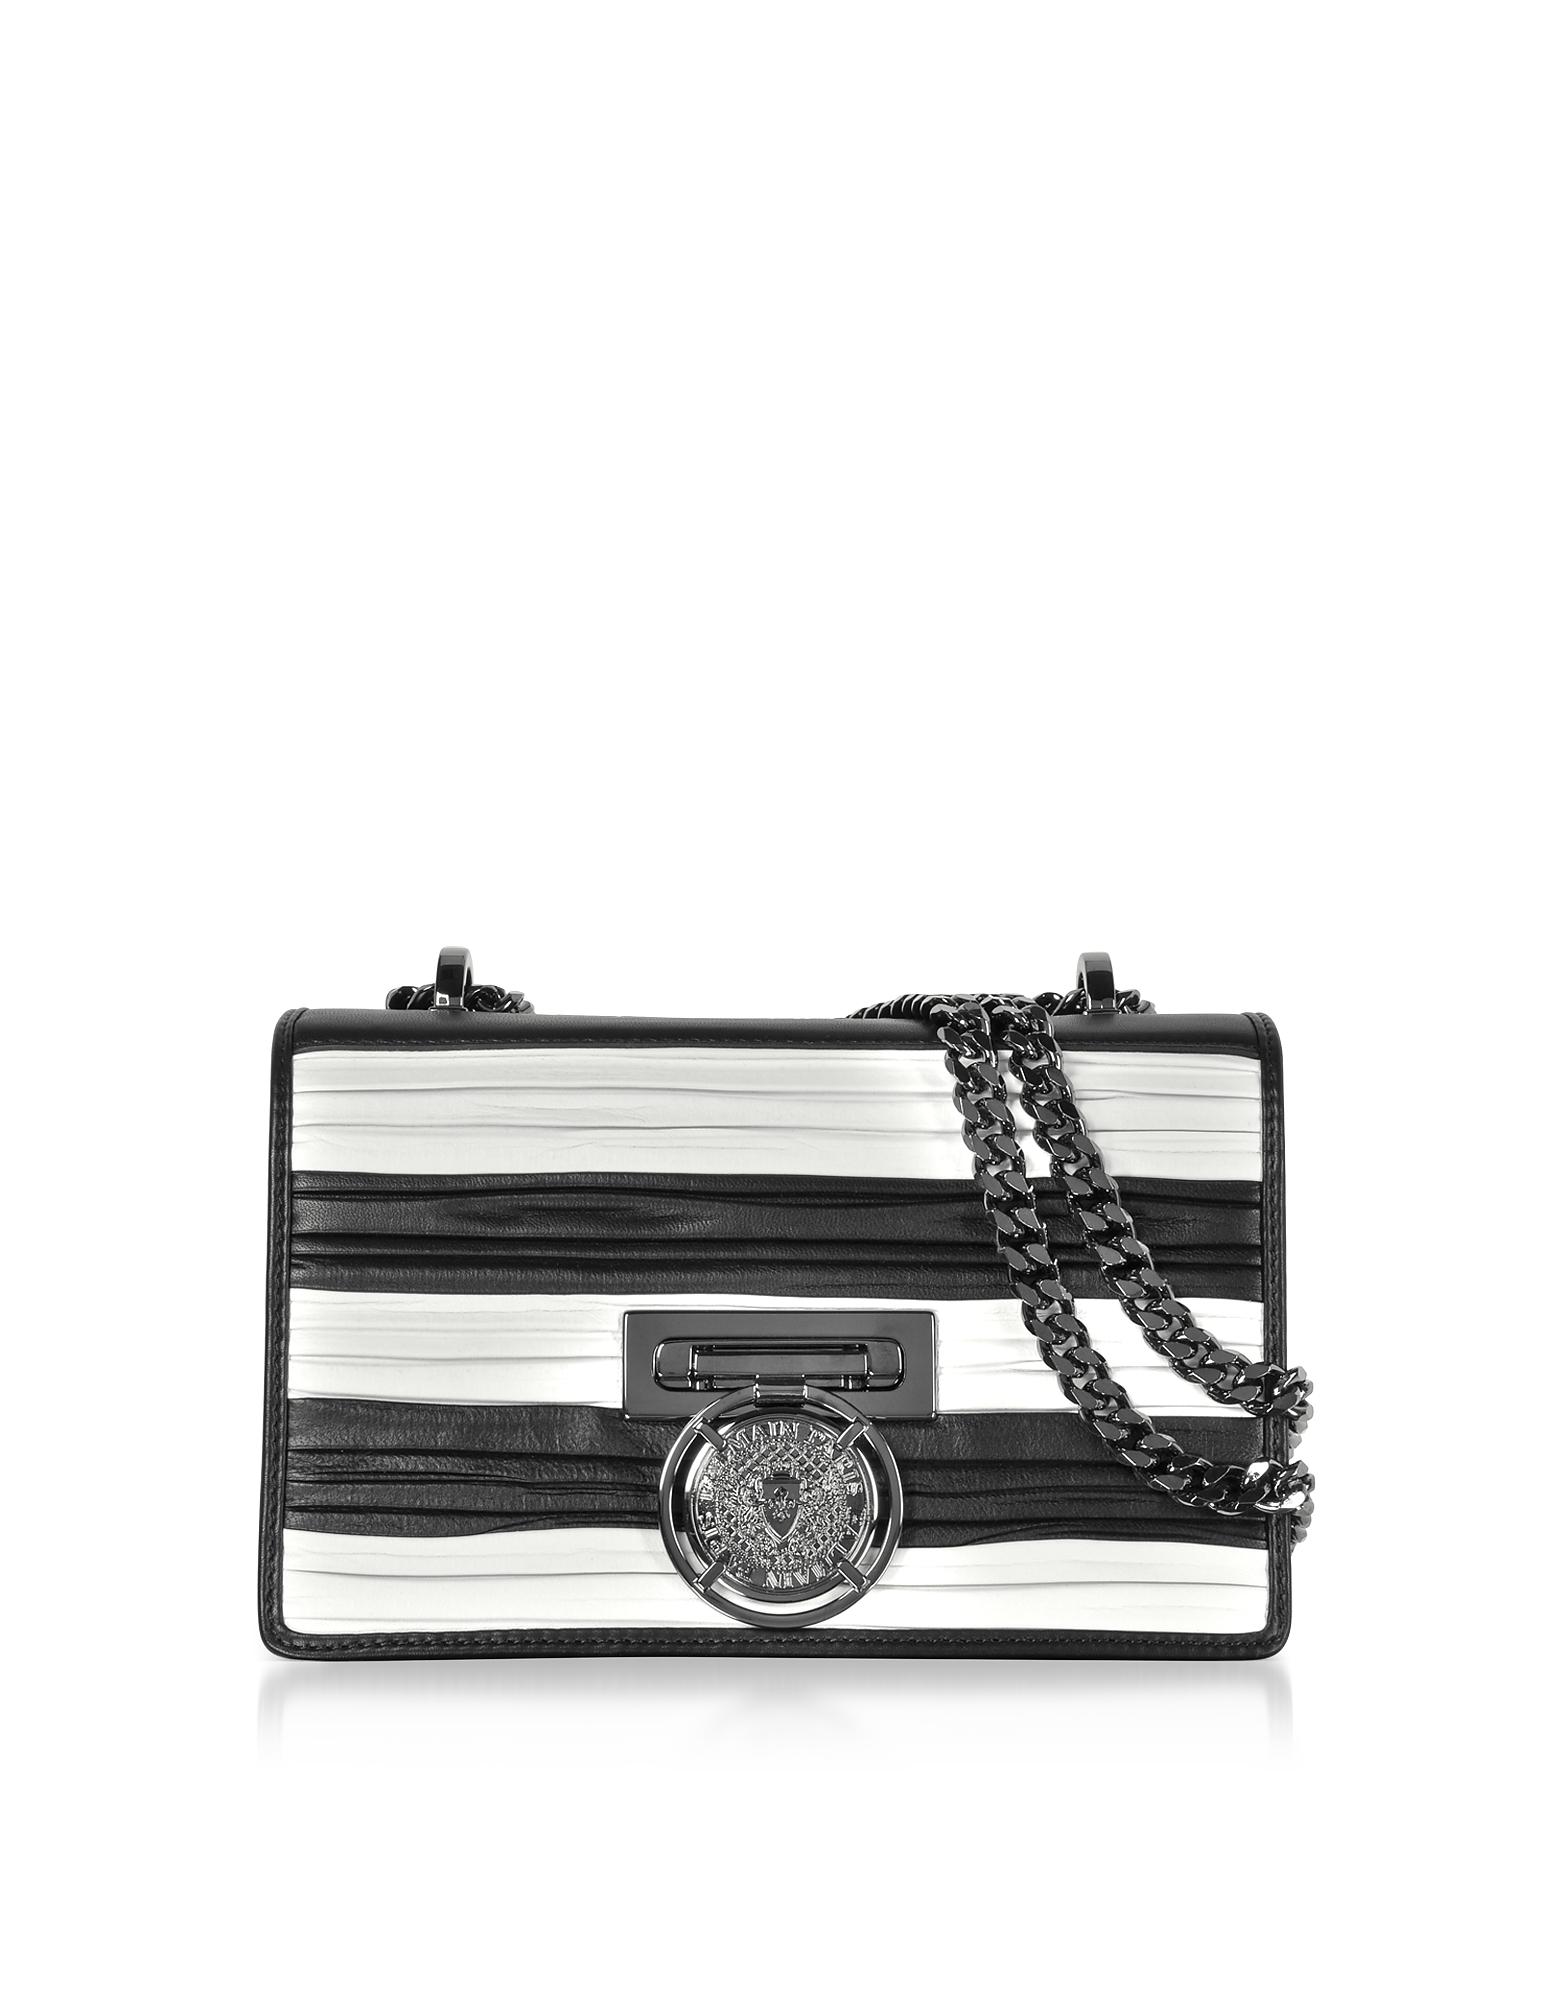 Balmain Handbags, Black/White Striped and Pleated Leather BBox 20 Flap Shoulder Bag